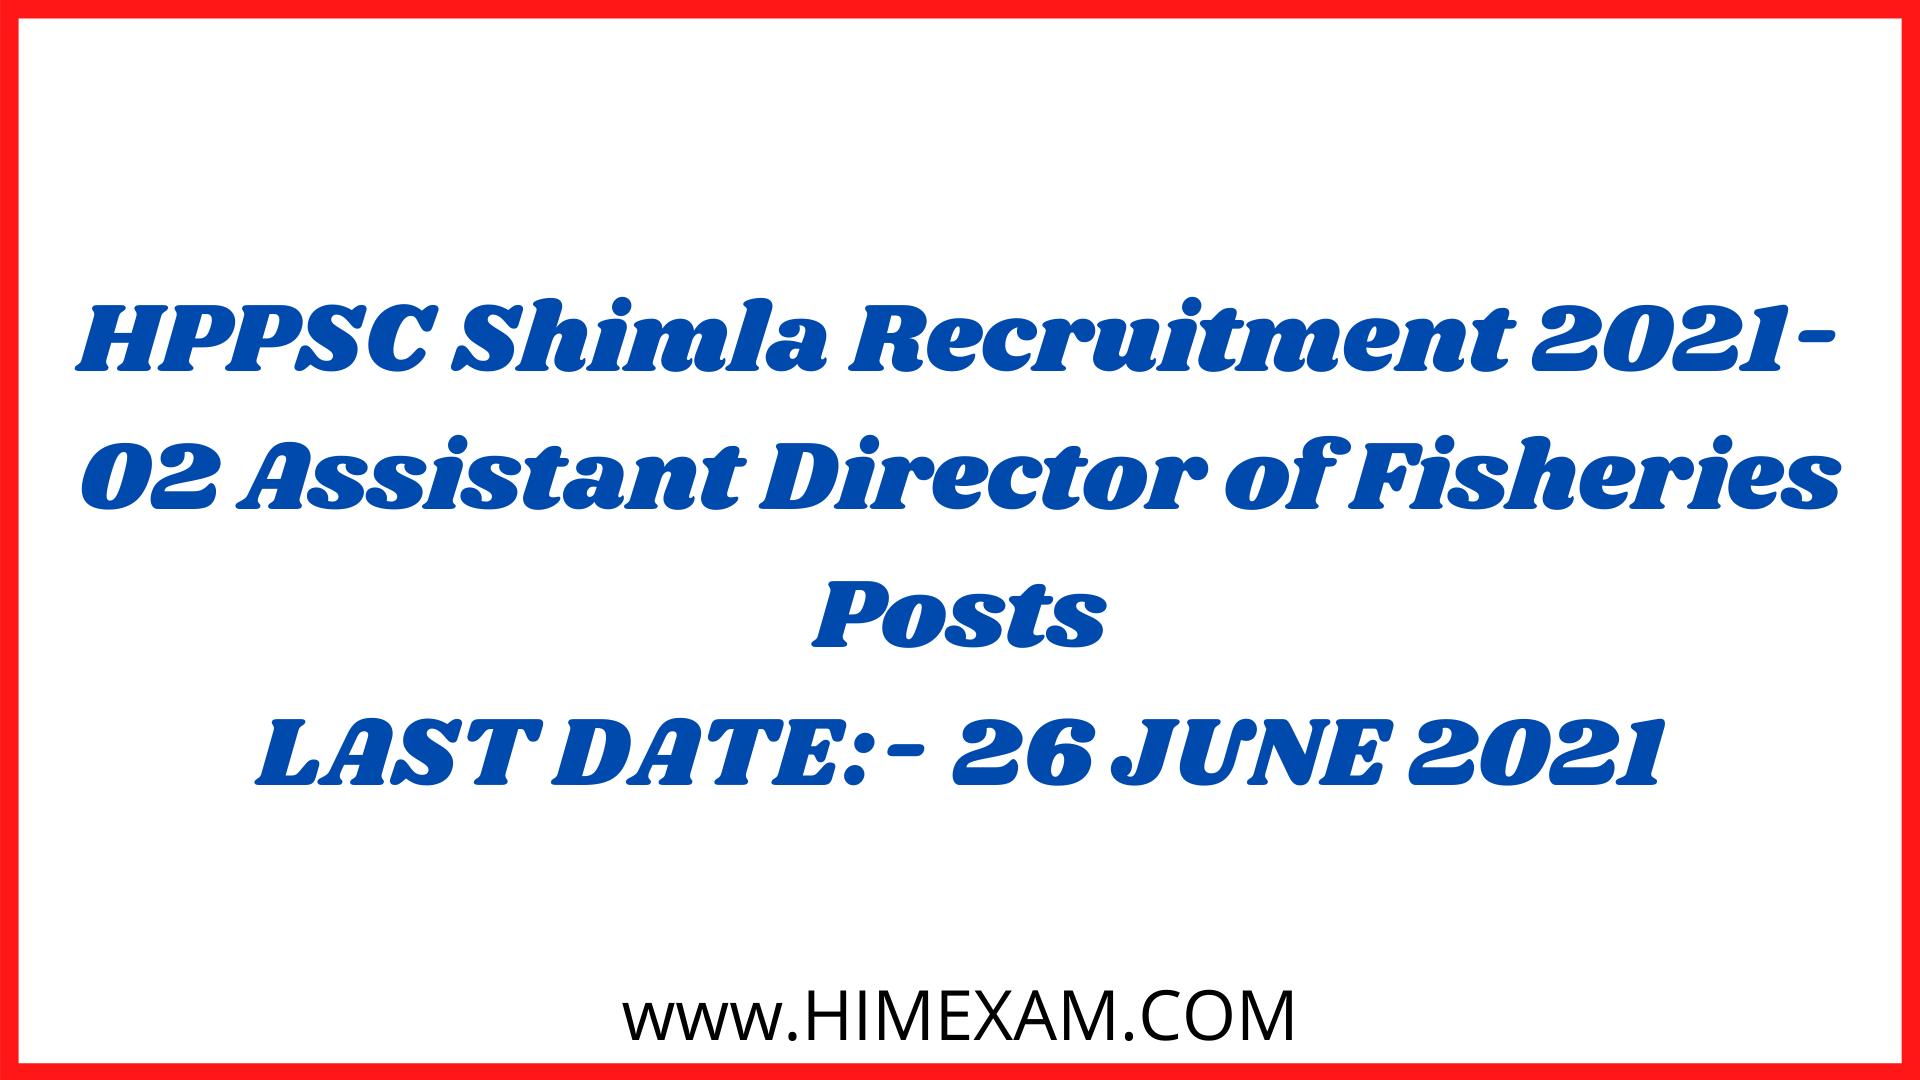 HPPSC Shimla Recruitment 2021-02 Assistant Director of Fisheries Posts